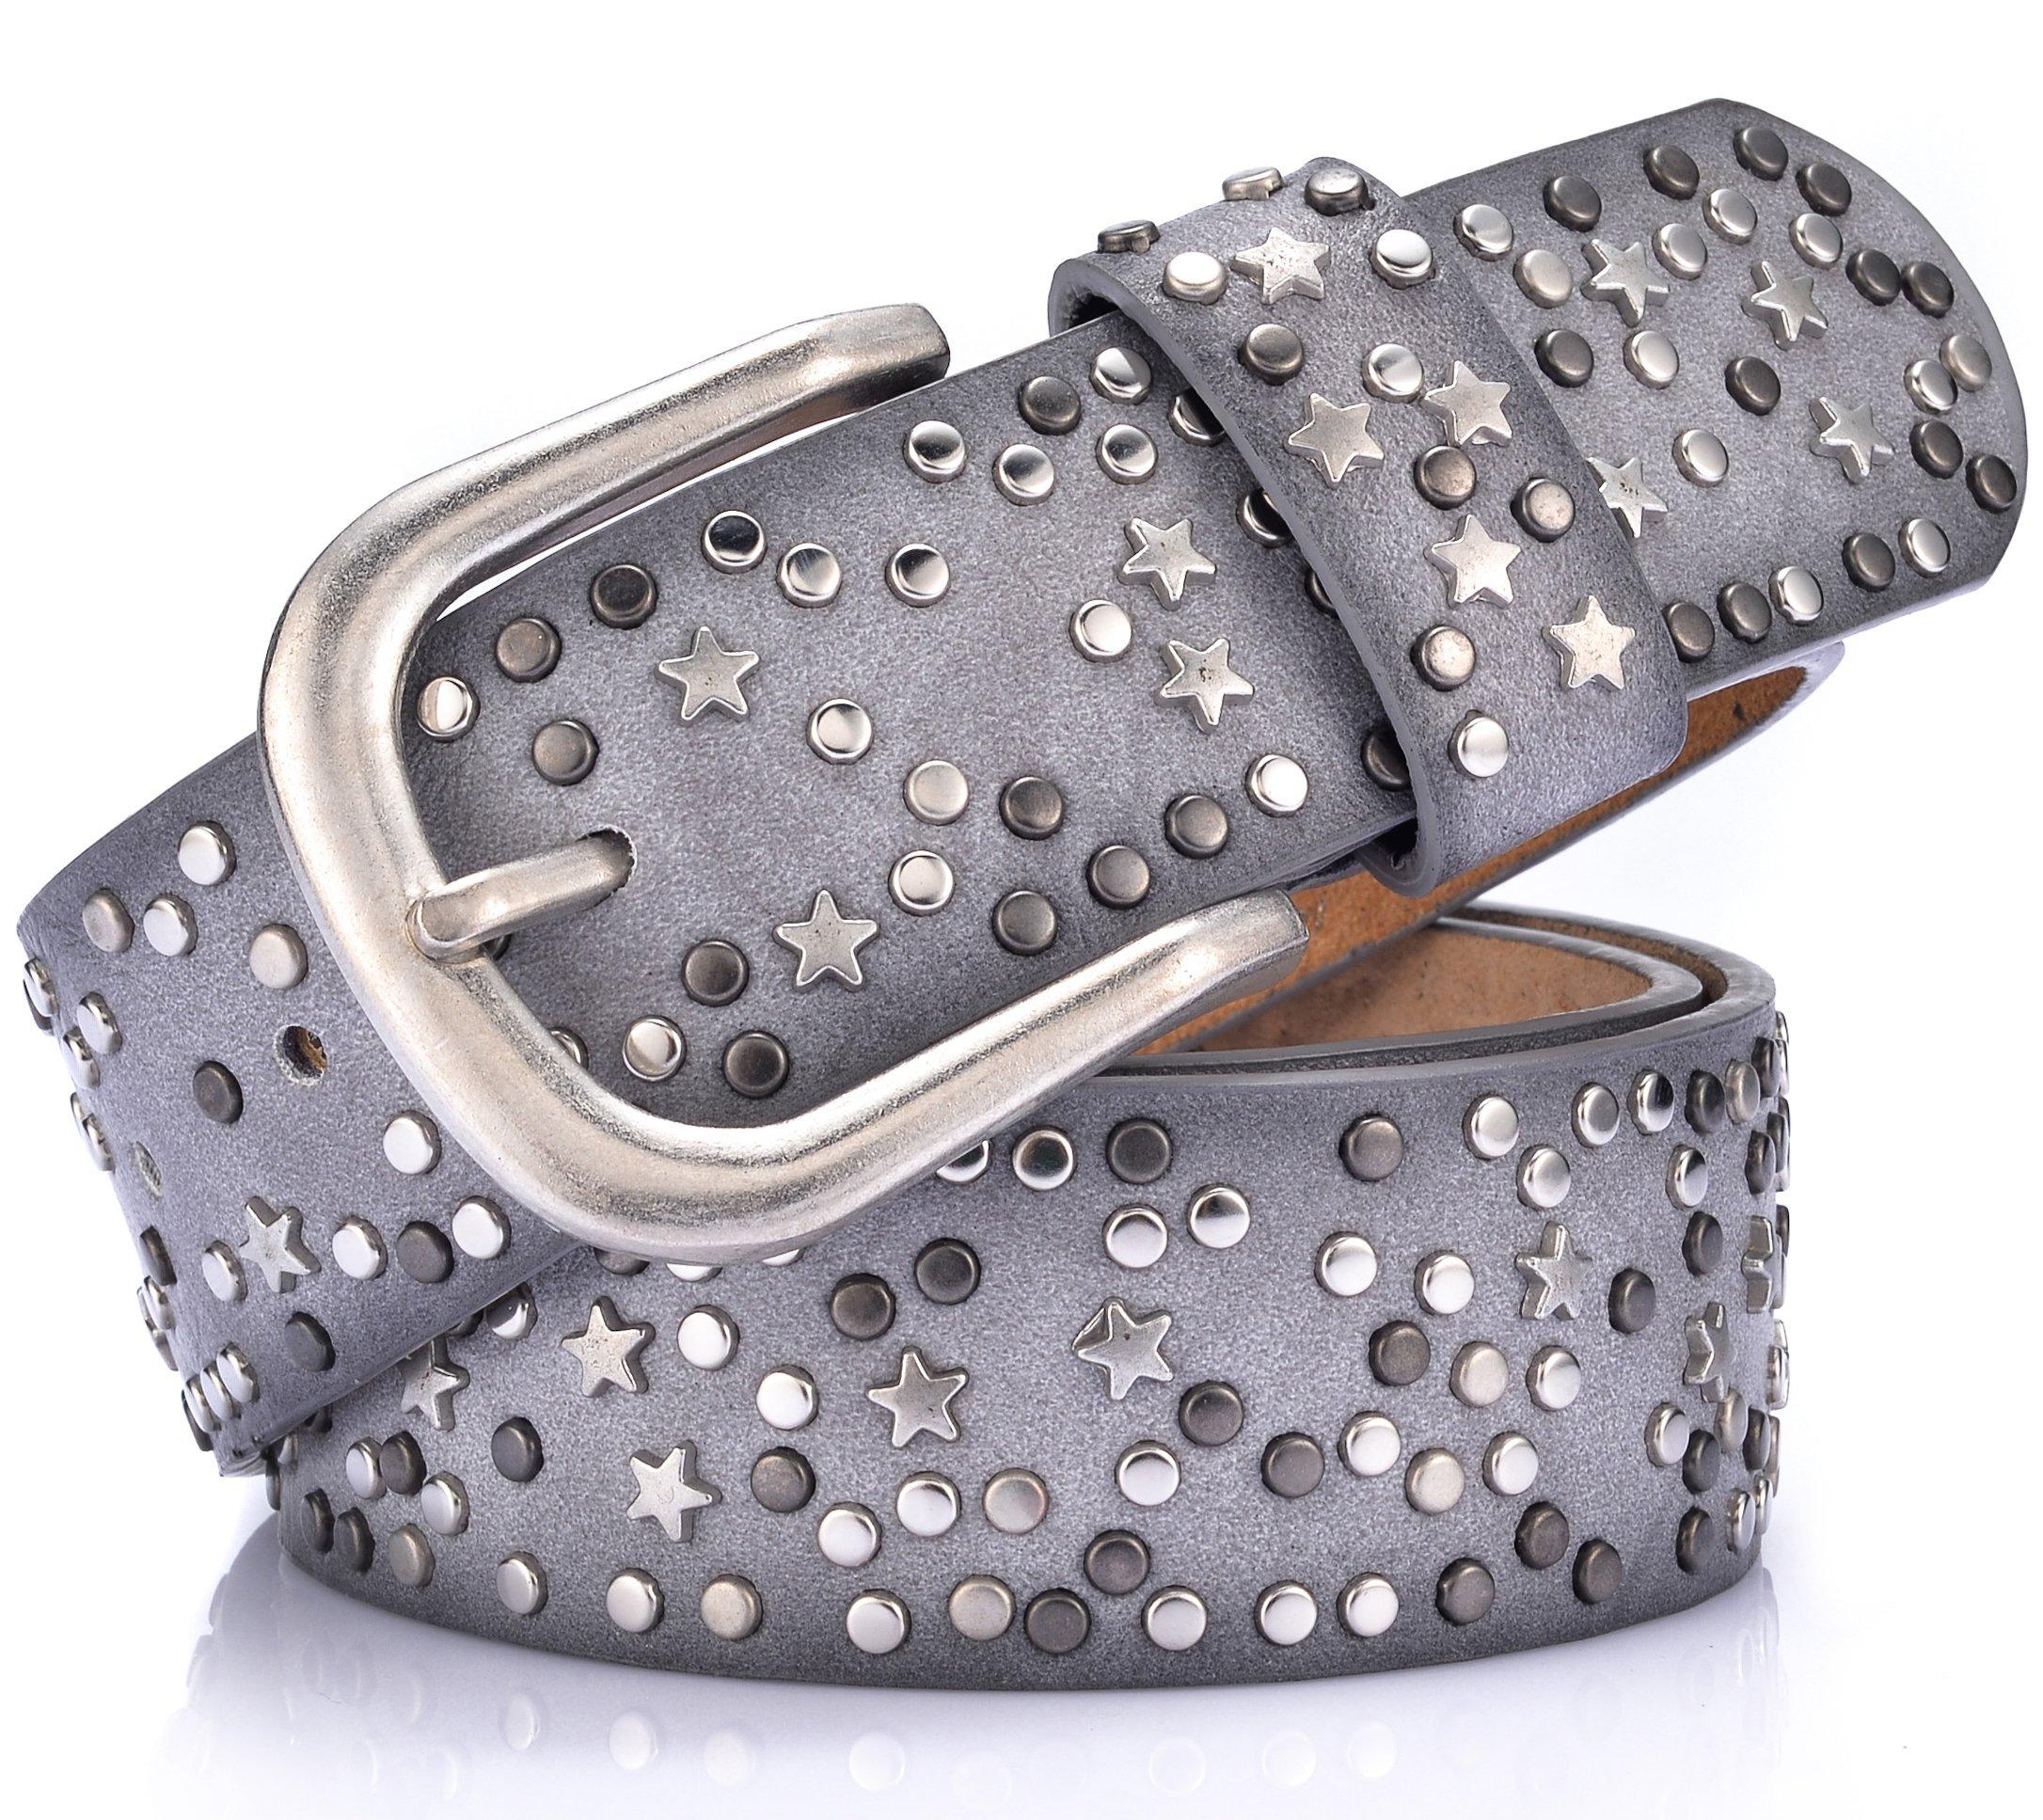 Ayli Women's Jean Belt, Stars Rivets Punk Rock Handcrafted Genuine Leather Belt, Free Gift Box, Gray, Fits Waist 26'' to 27'' (US Pant Size 2-4), bt6b507gy090